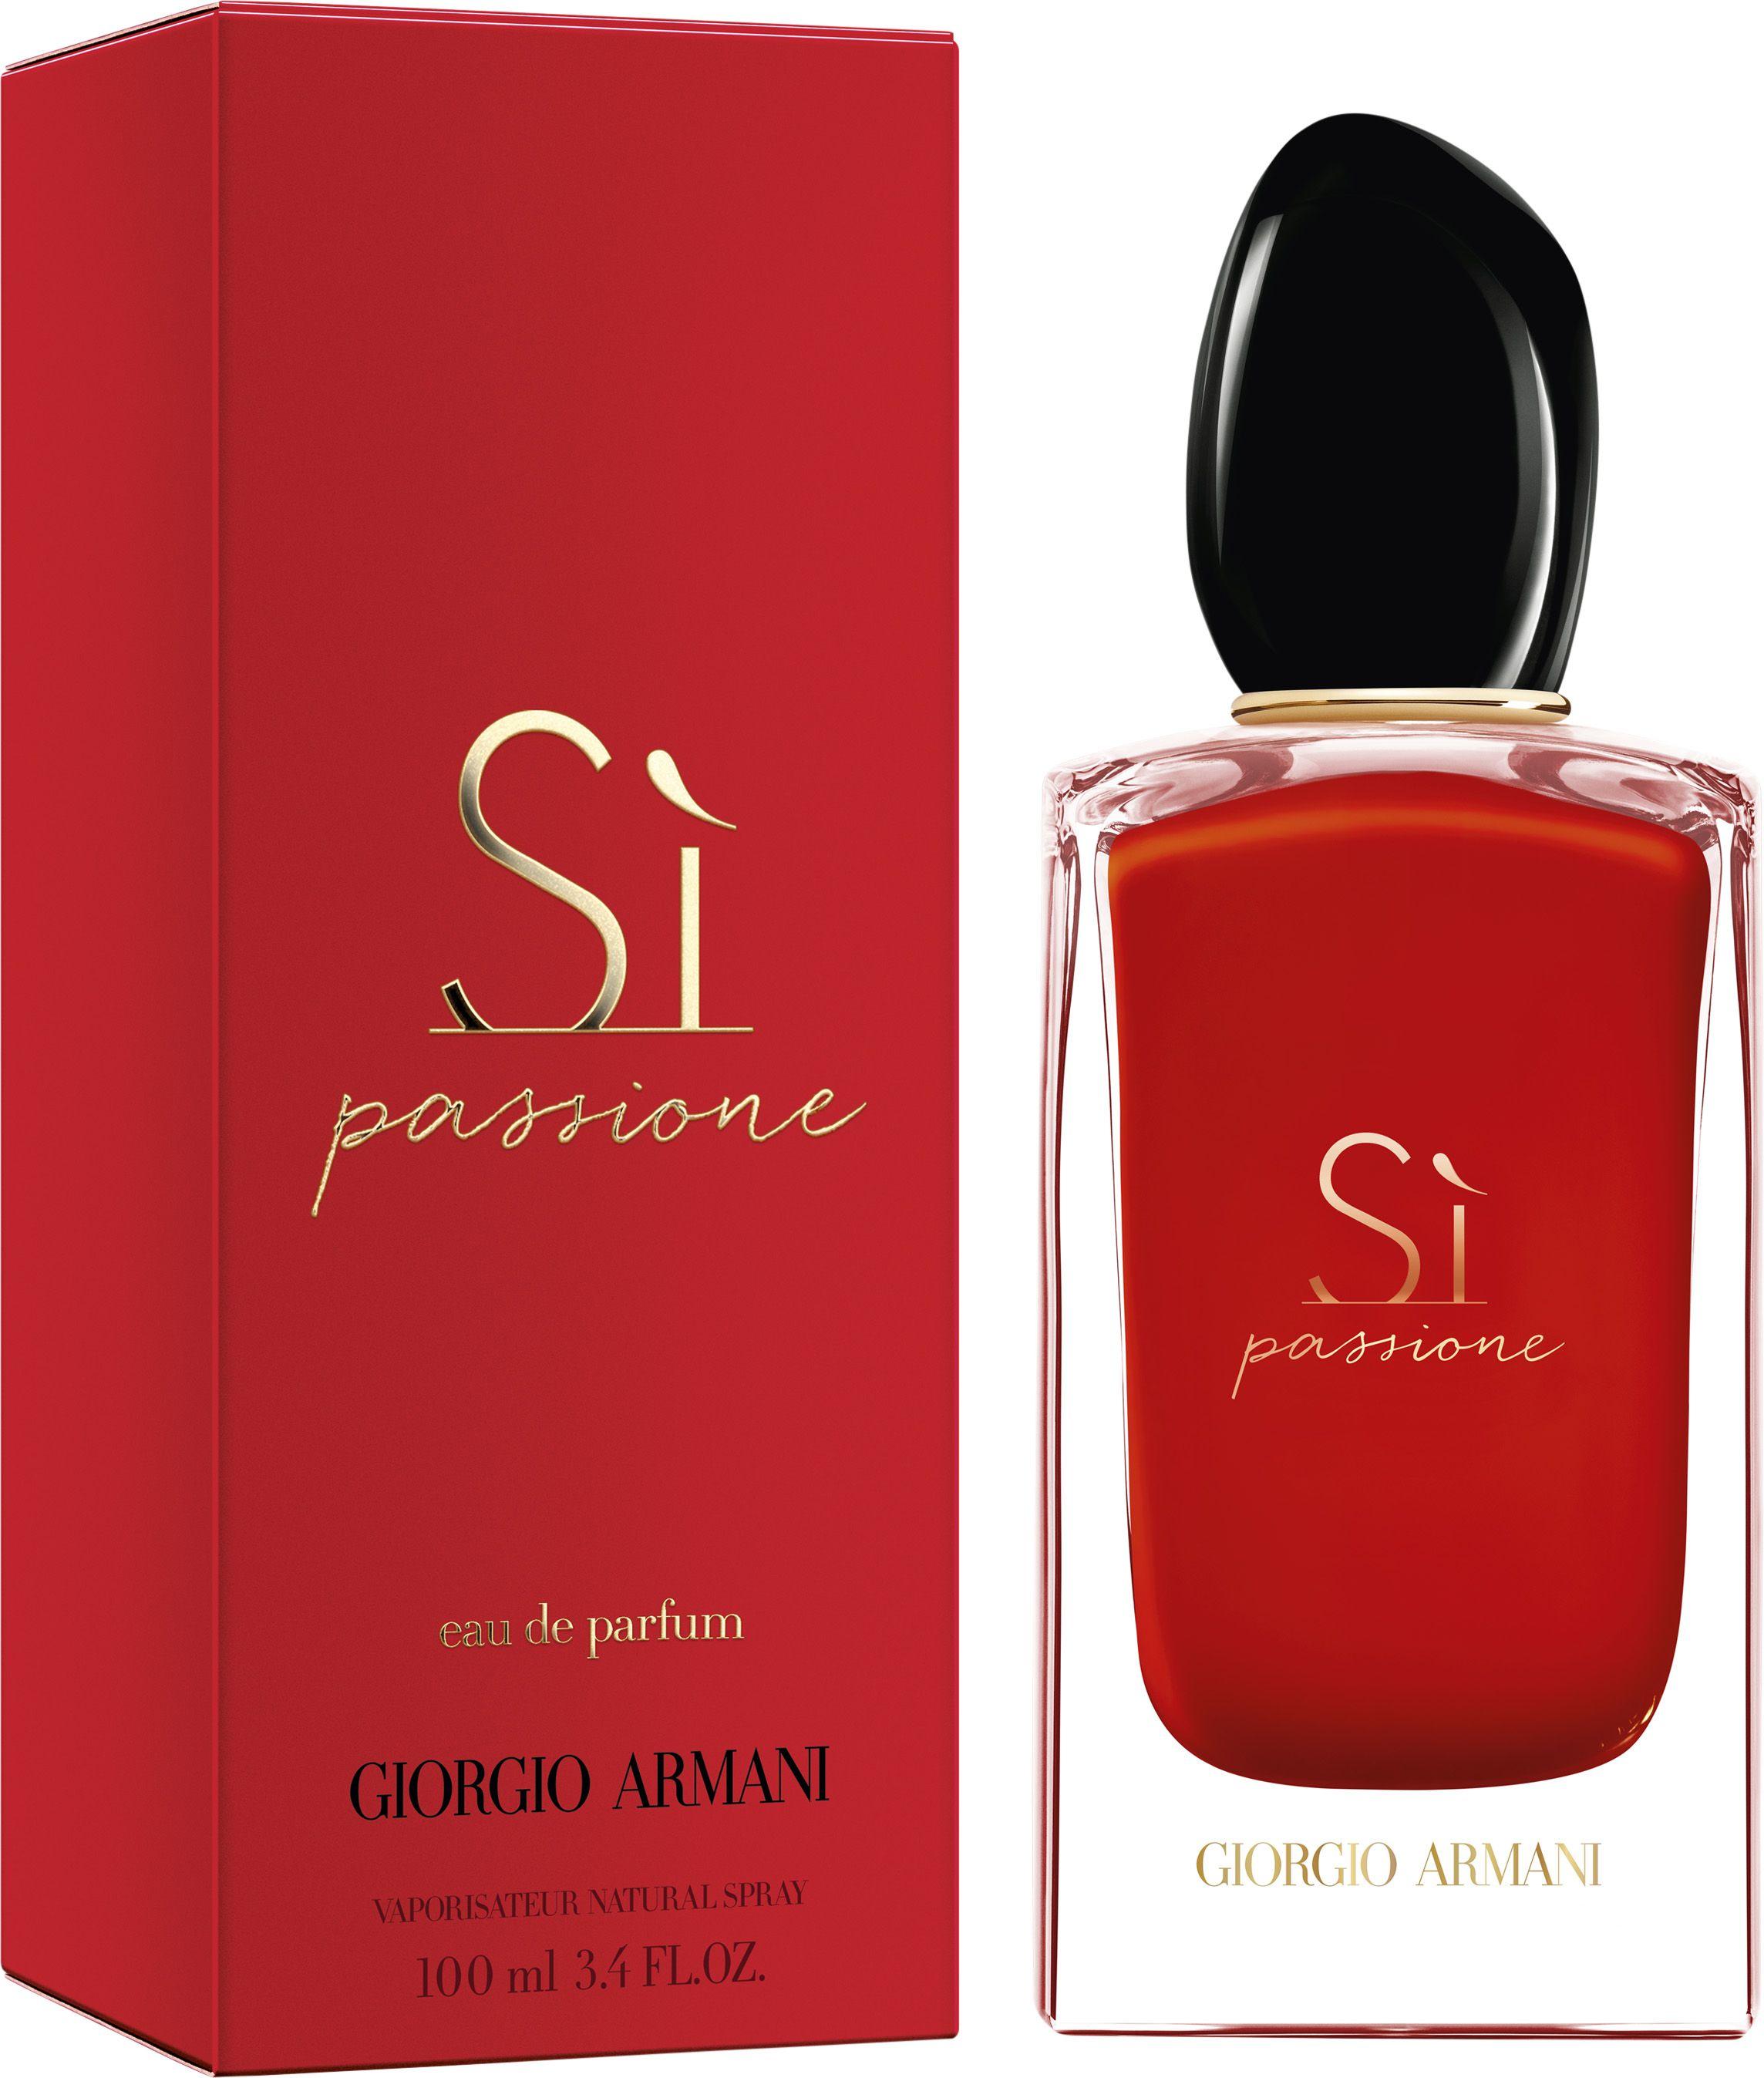 80de6fddb8d Giorgio Armani Beauty Si Passione Eau de Parfum 100 ml